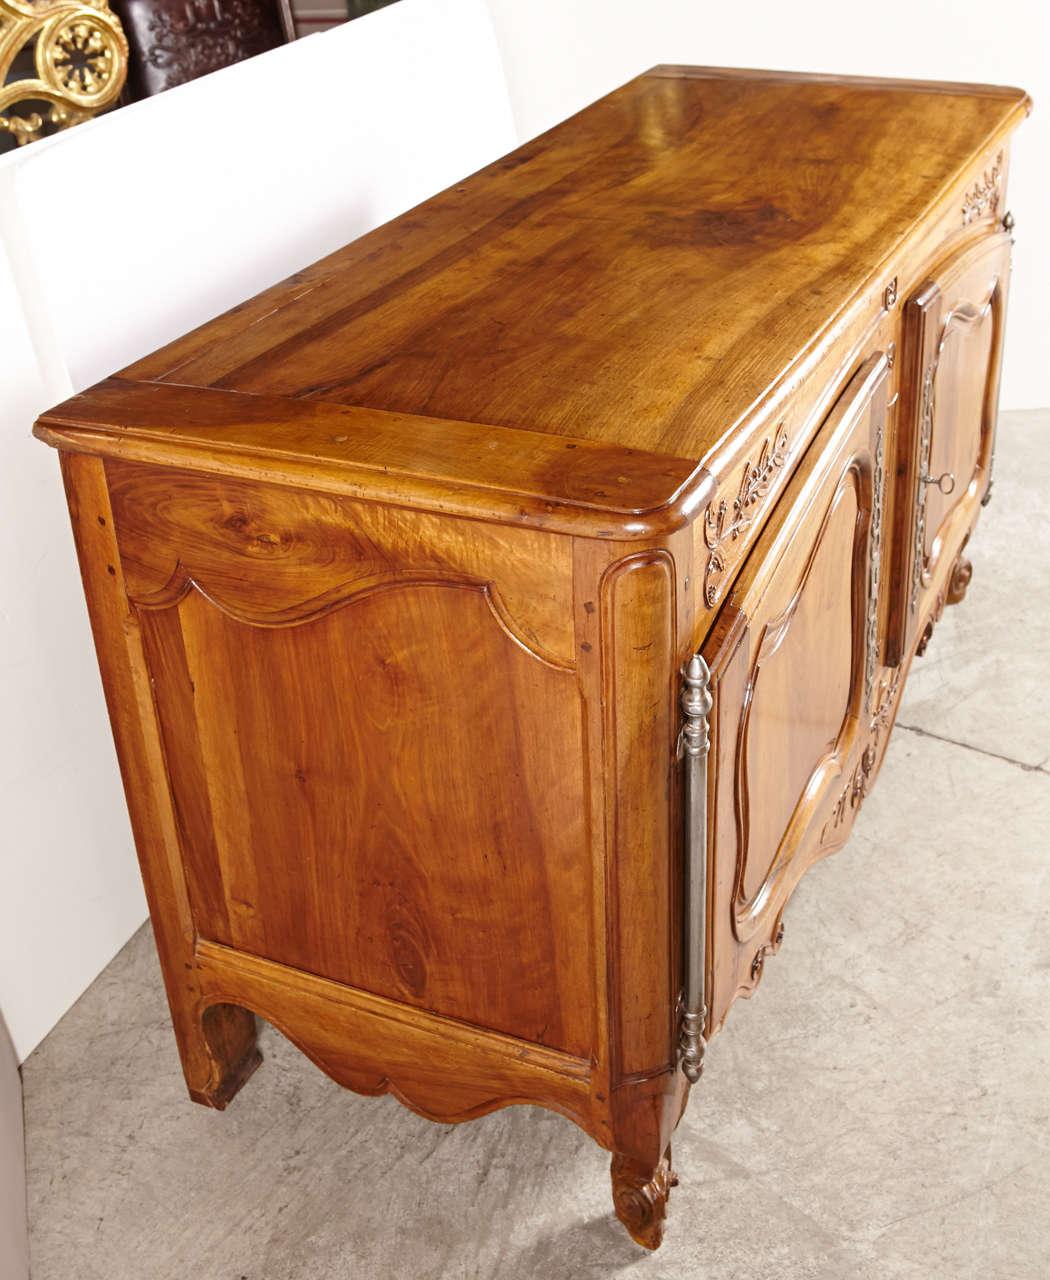 Best Kitchen Jamestown Ny: Grande 18th Century Walnut Wood Buffet Arlesian At 1stdibs